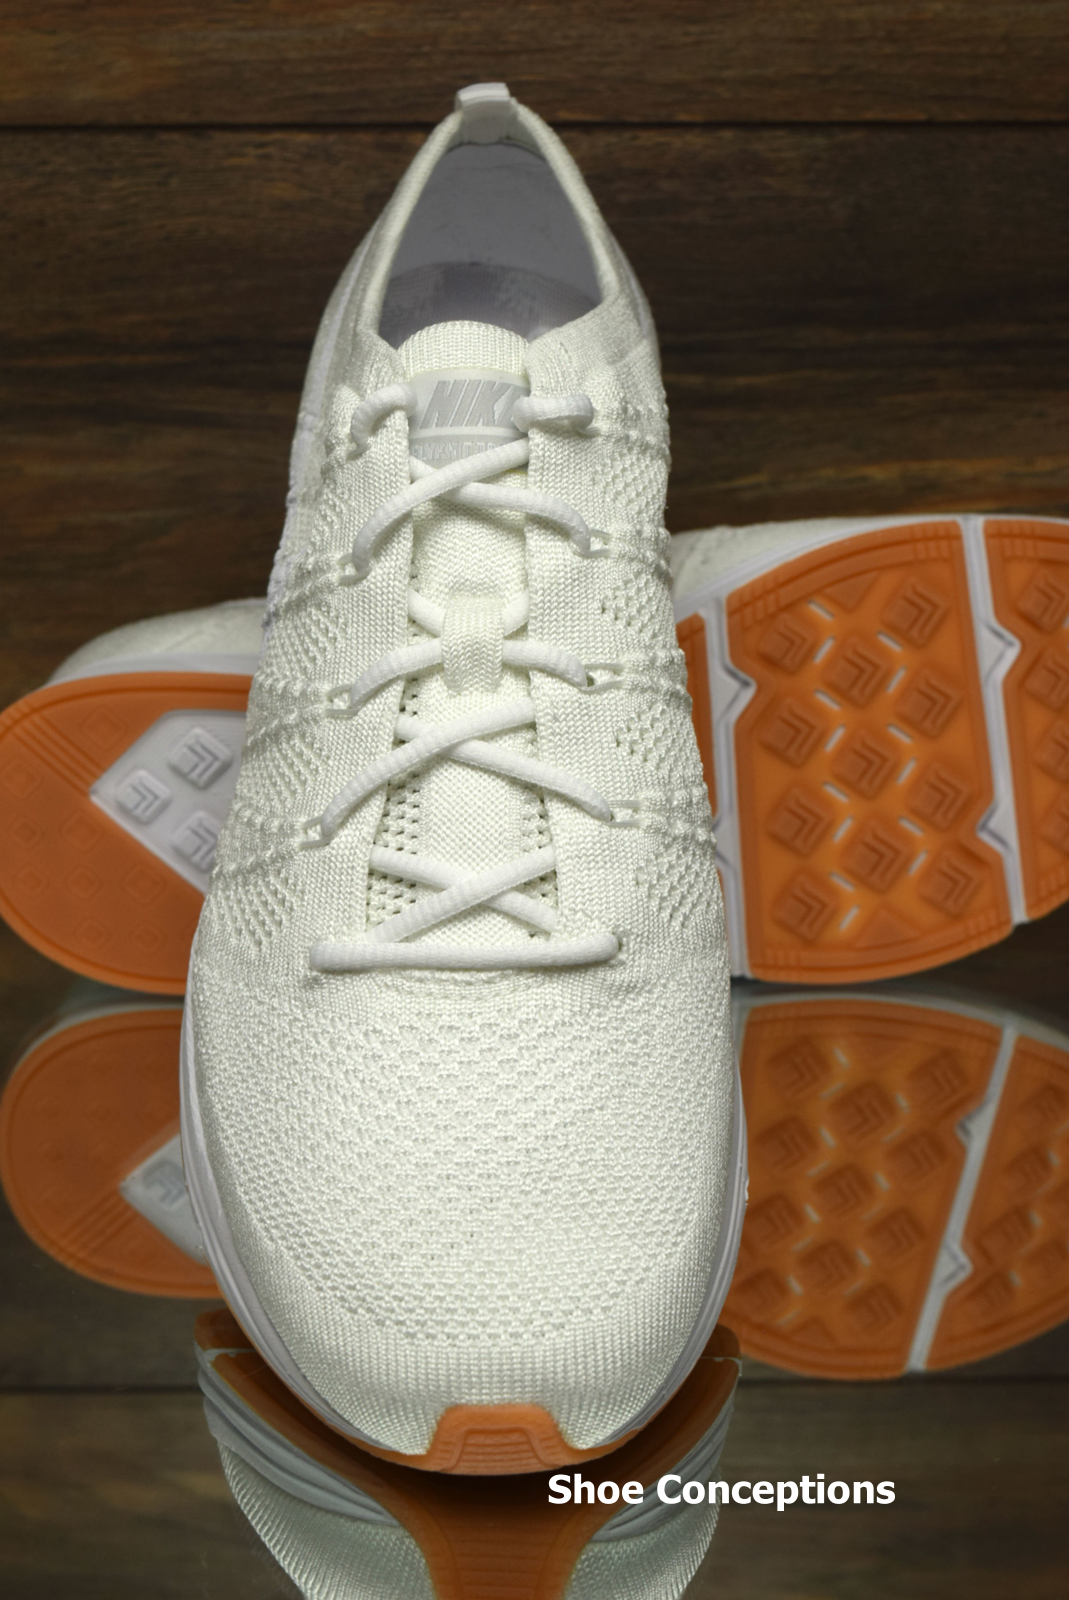 Nike flyknit trainer drei weiße ah8396-102 laufschuhe männer - - - multi - größe 405d7f